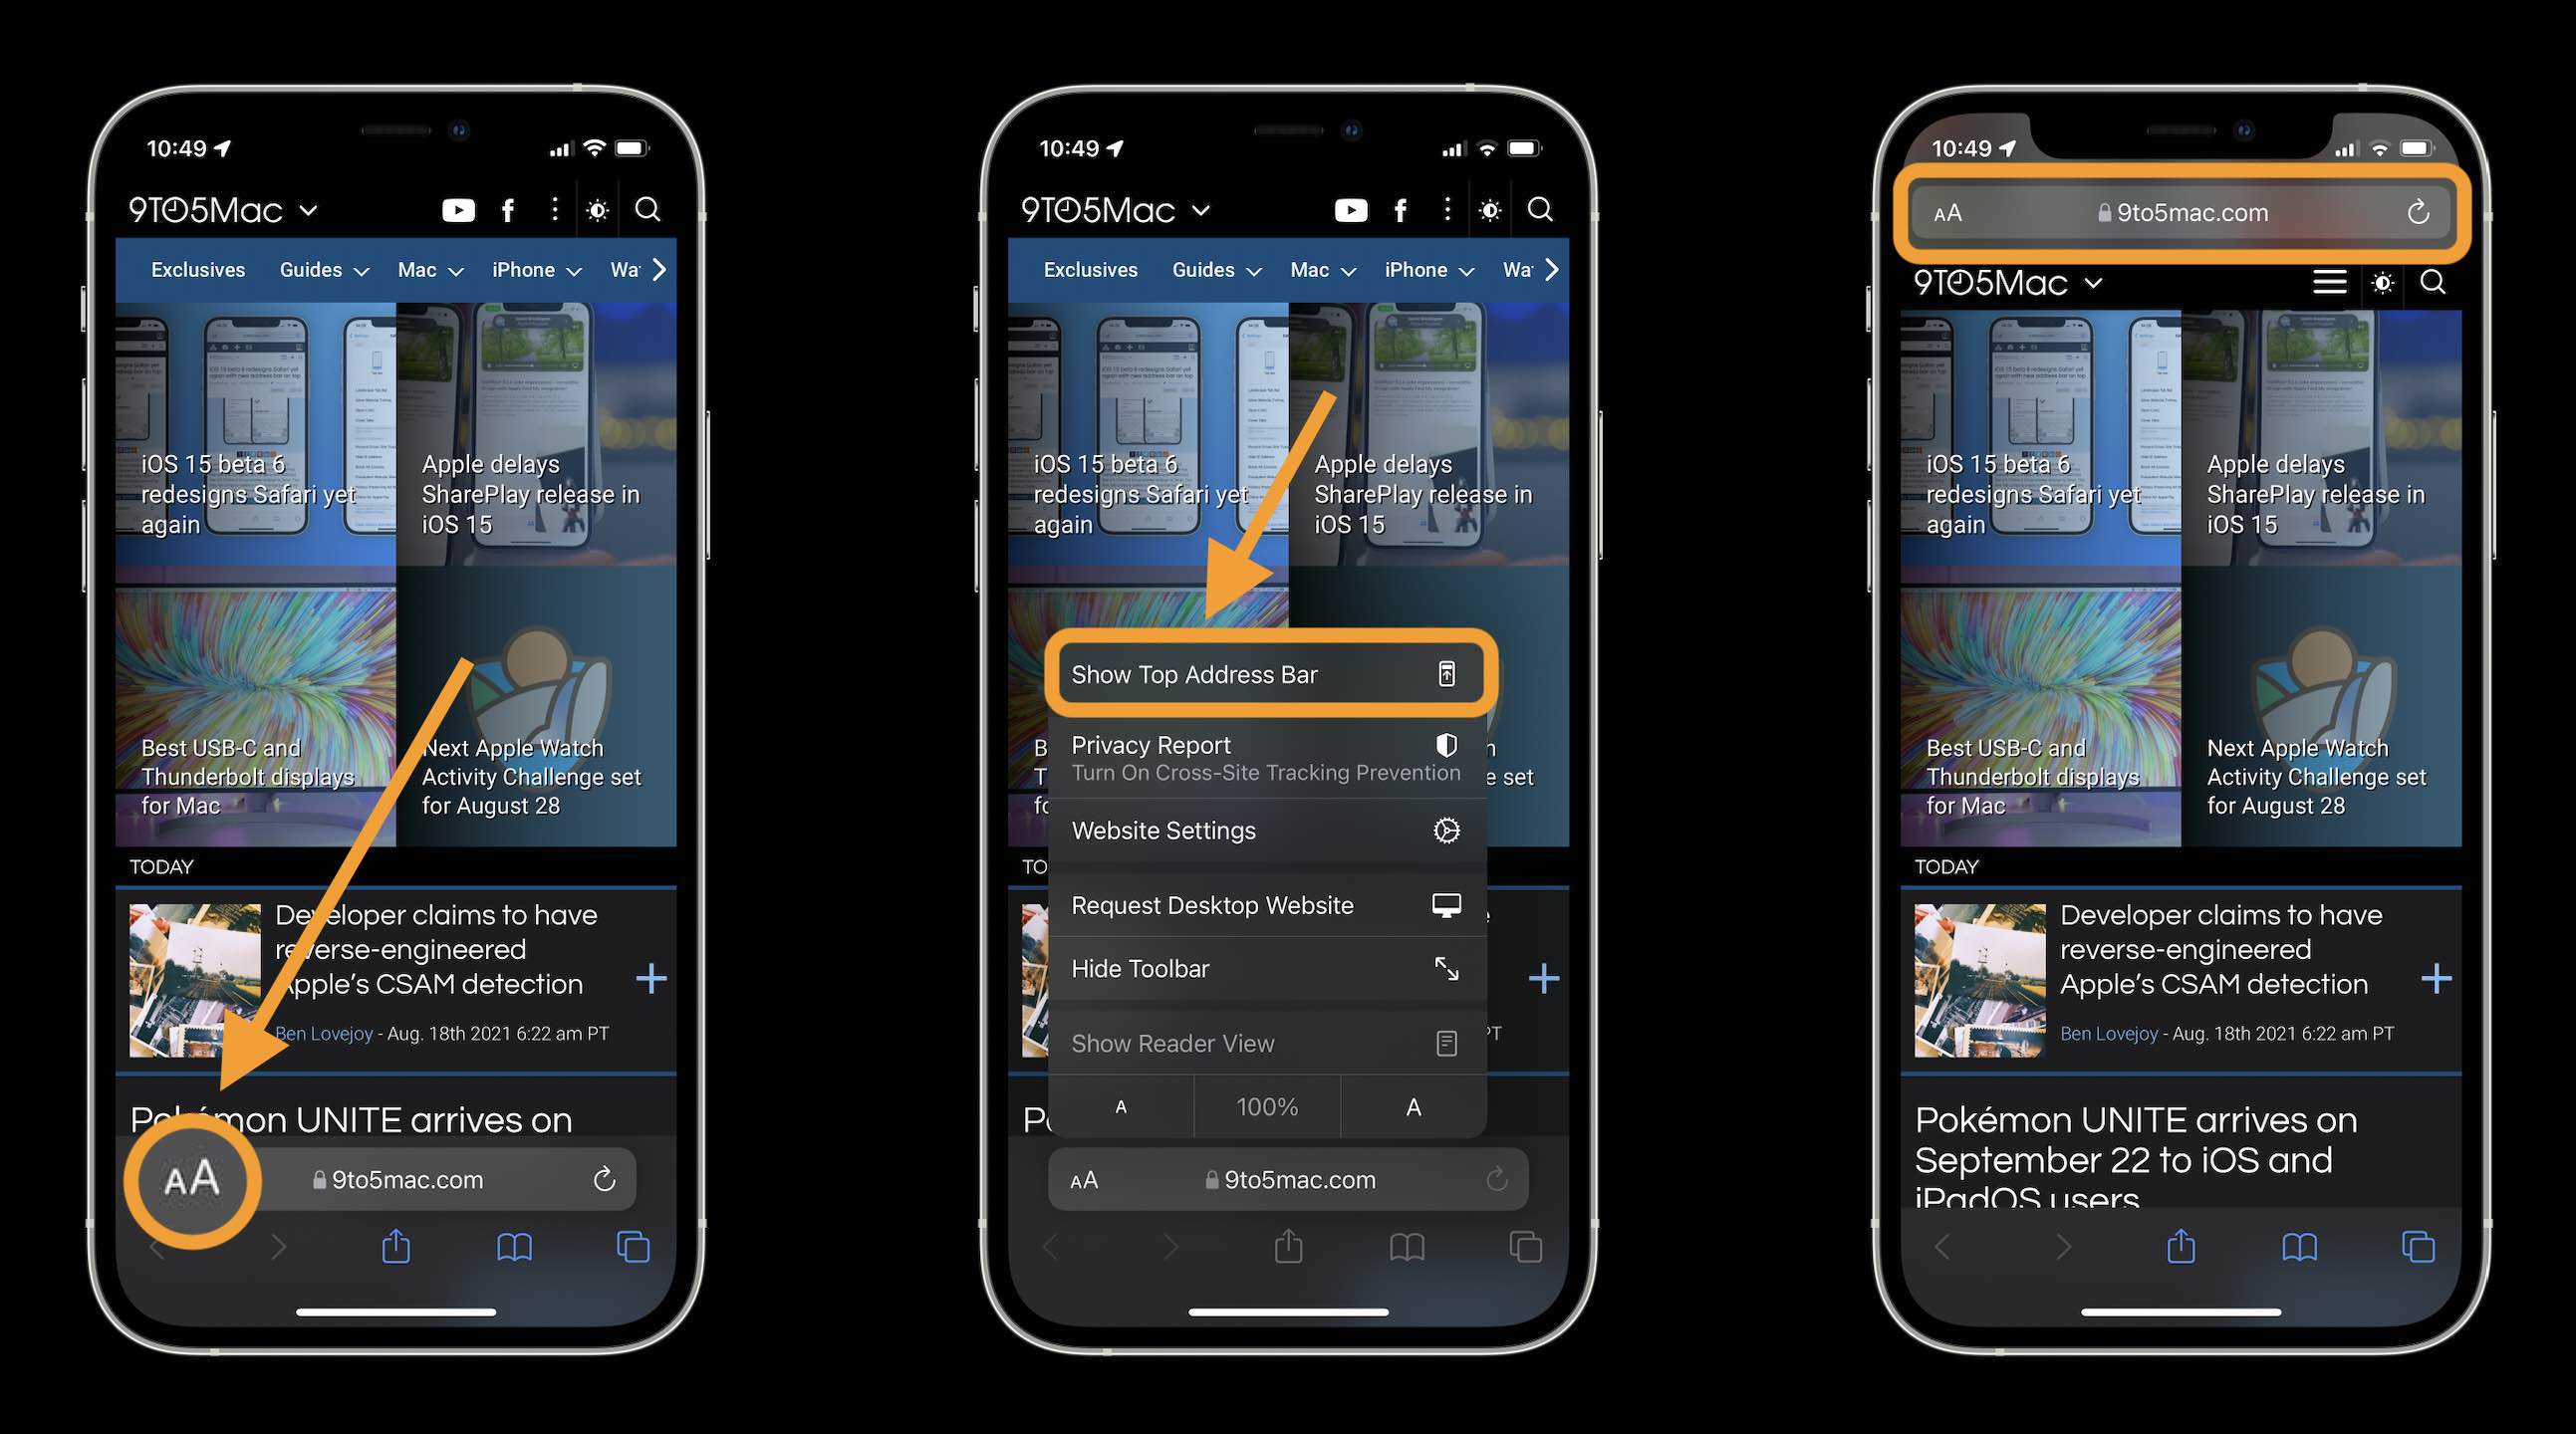 How to change iOS 15 Safari address/search bar on iPhone walkthrough 1 - tap aA icon in bottom left corner in the address/search bar and tap Show Top Address Bar